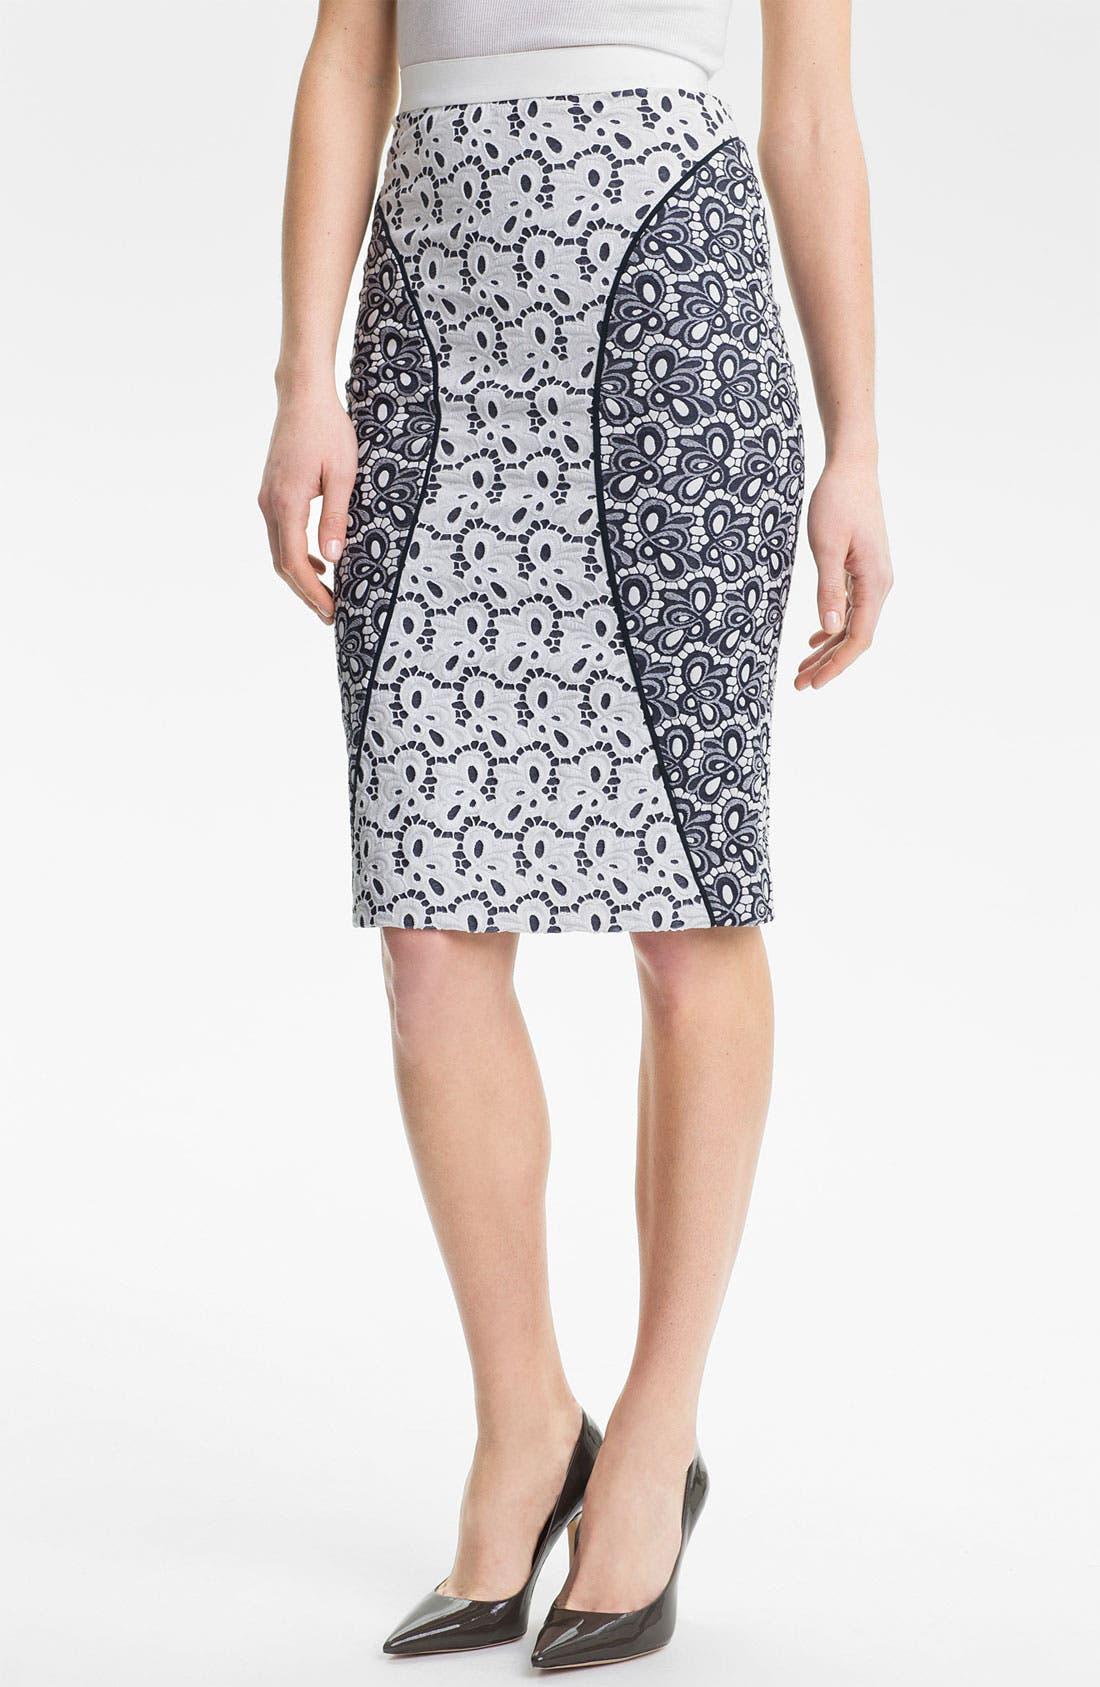 Alternate Image 1 Selected - Rebecca Minkoff 'Della' Skirt